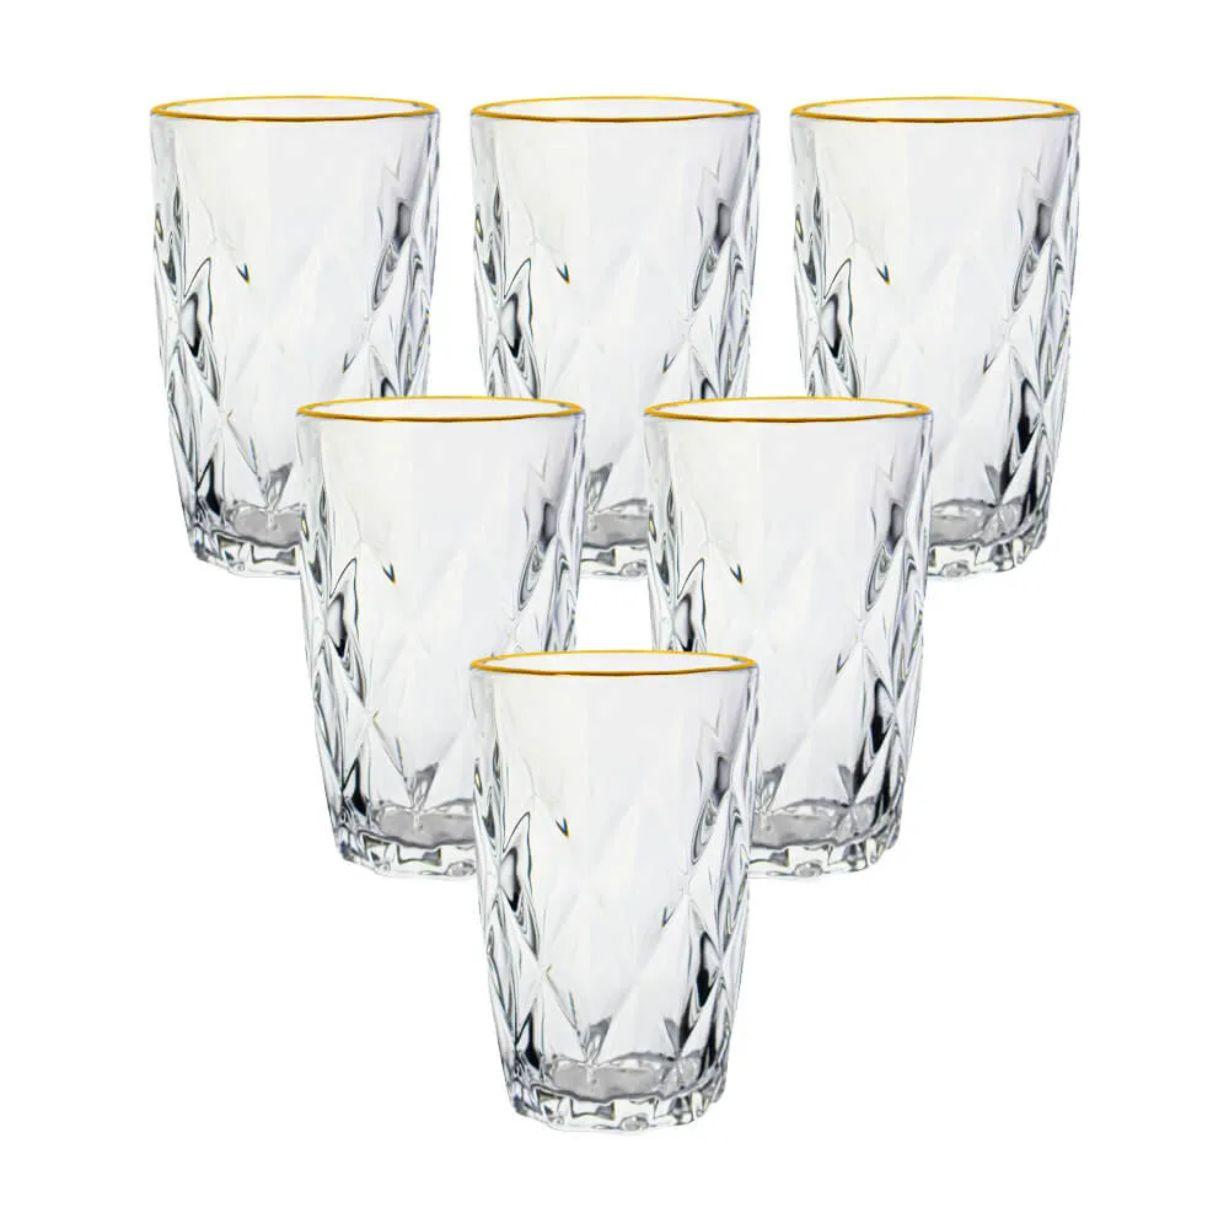 Conjunto 6 Copos de Vidro Diamond Transparente Fio de Ouro 350ml - Lyor